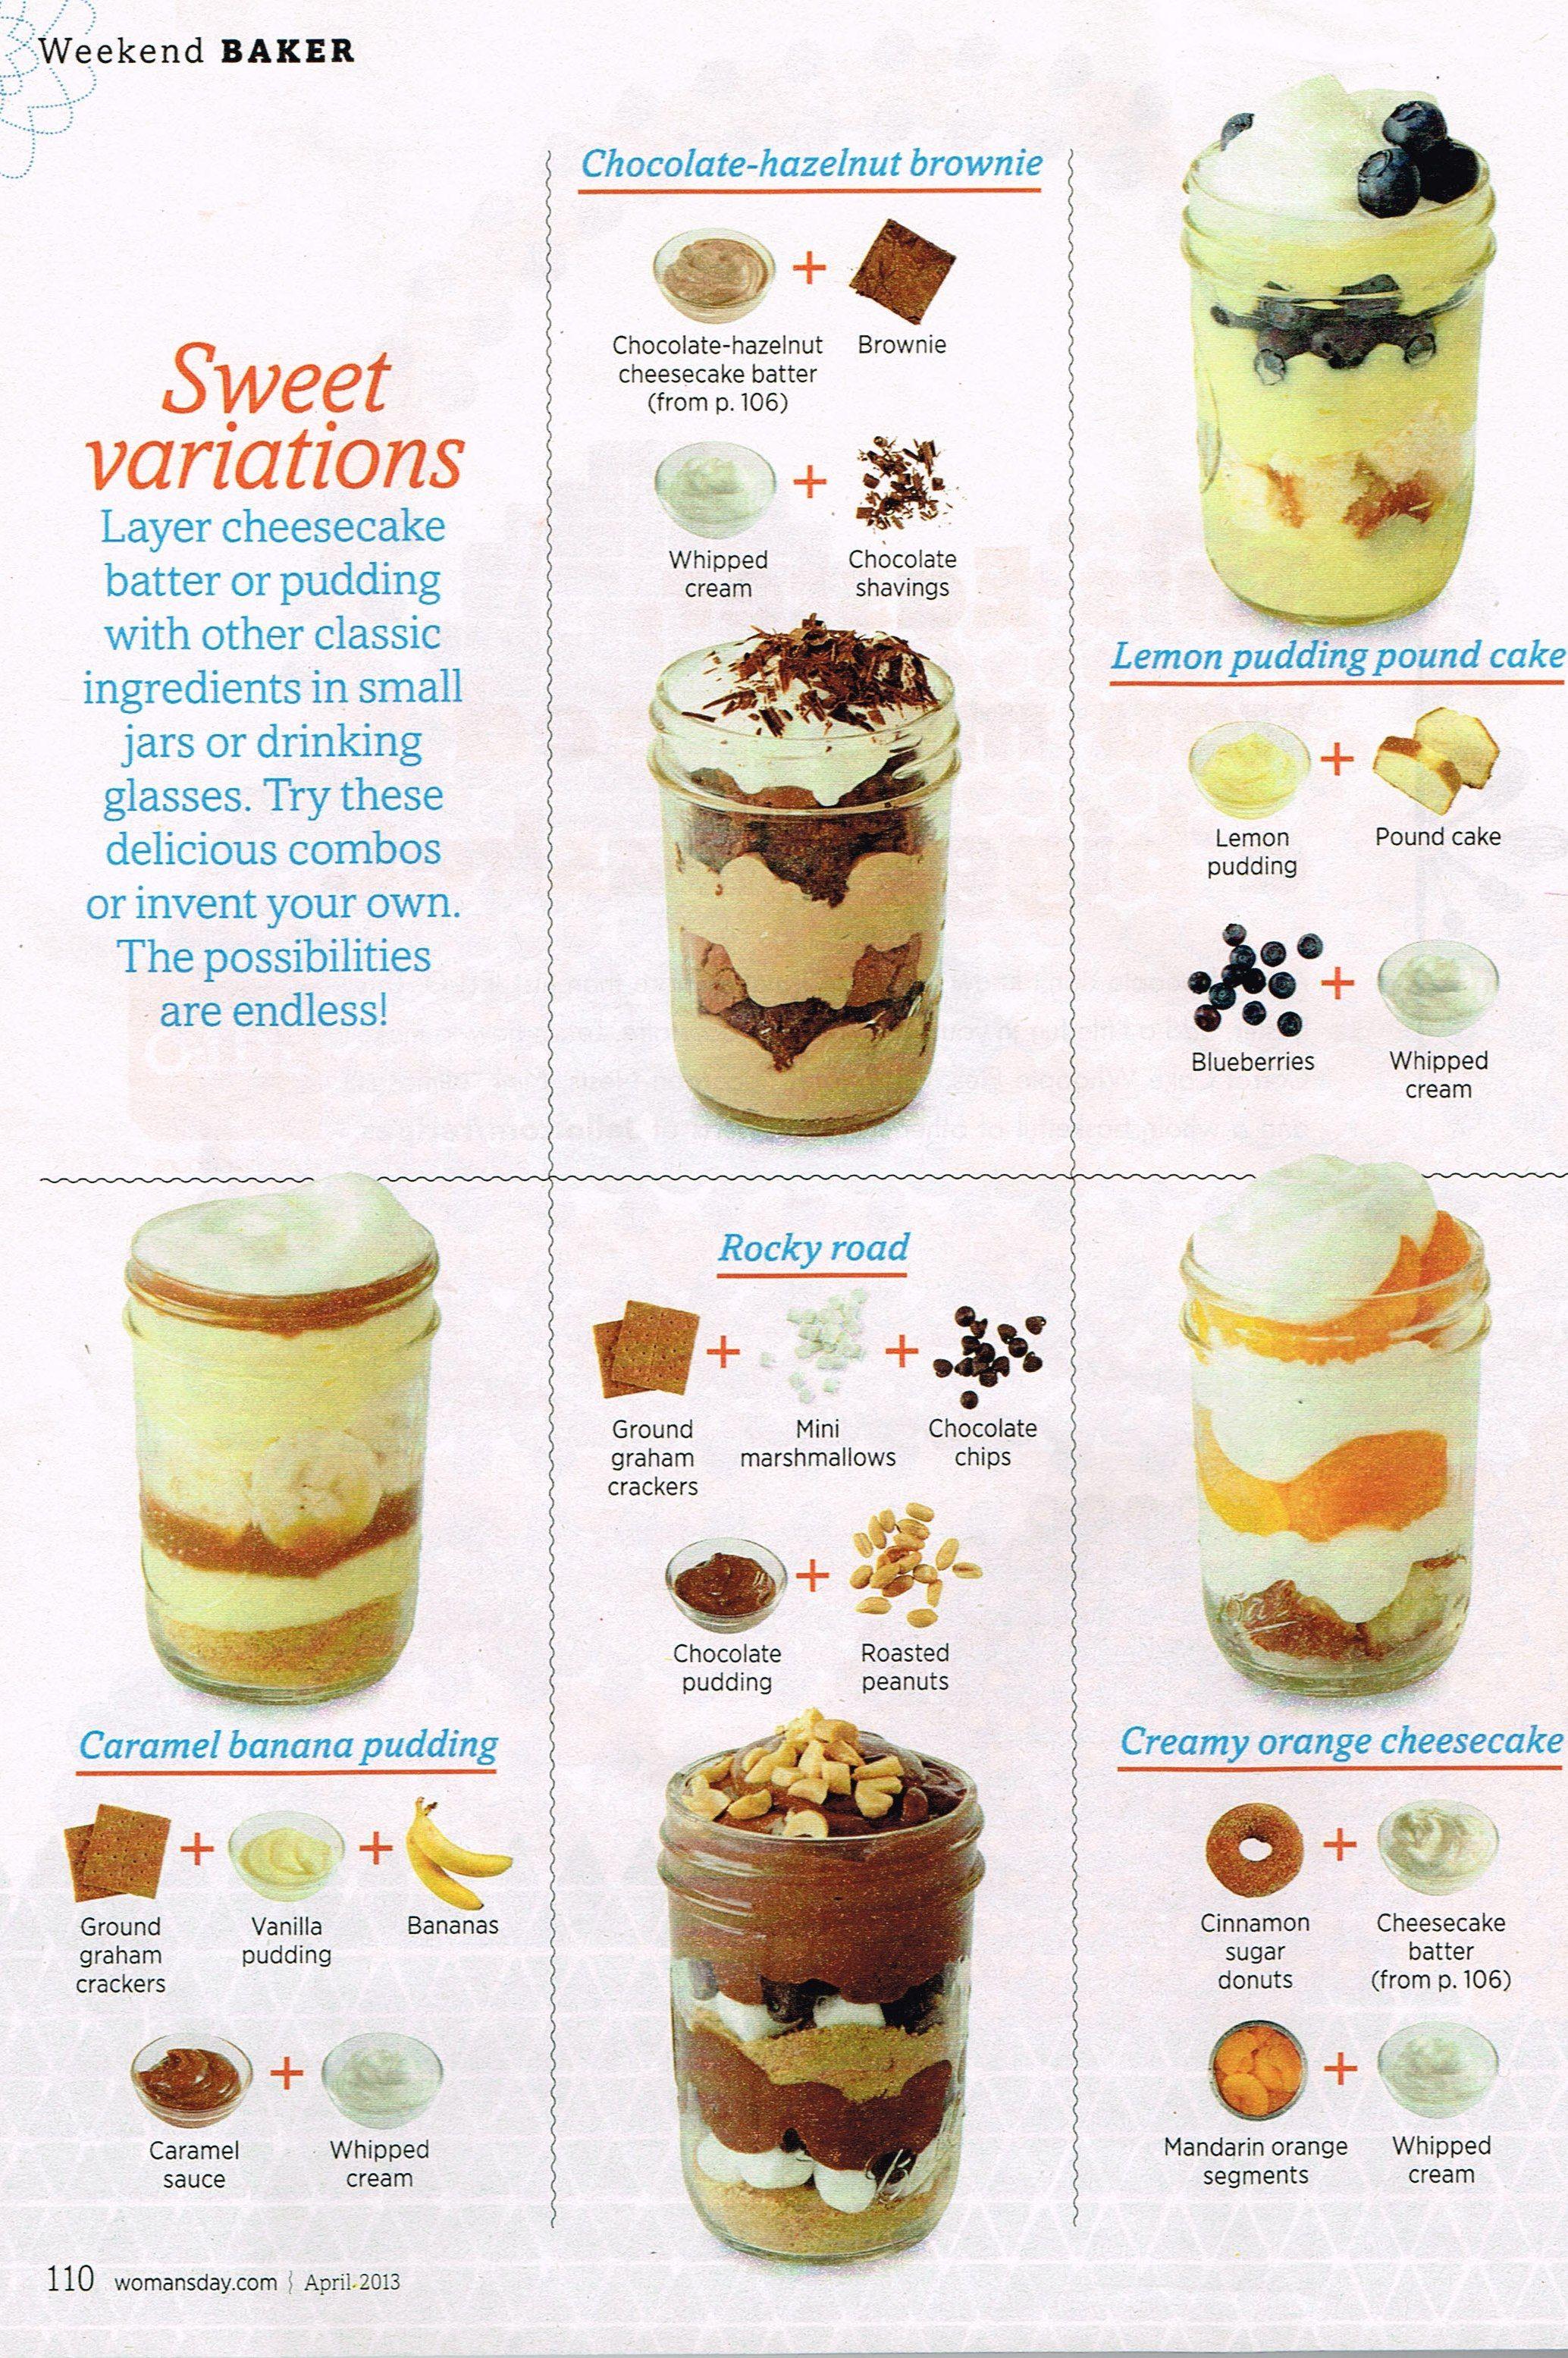 Pin By December Mackedanz On Food Mason Jar Desserts Desserts Mason Jar Meals